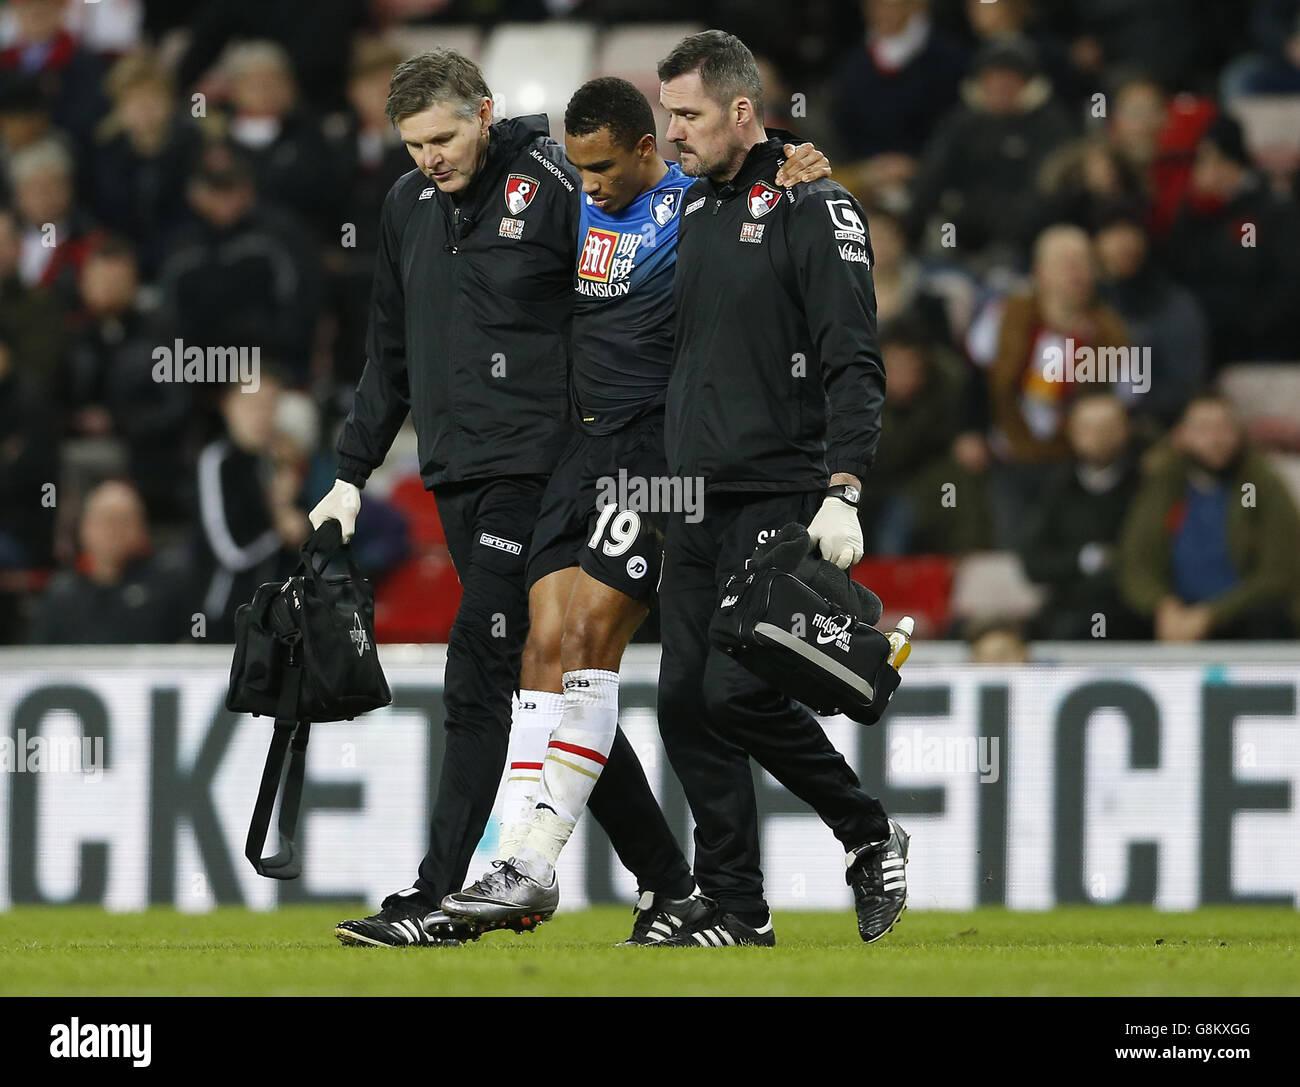 Sunderland v AFC Bournemouth - Barclays Premier League - Stadium of Light - Stock Image